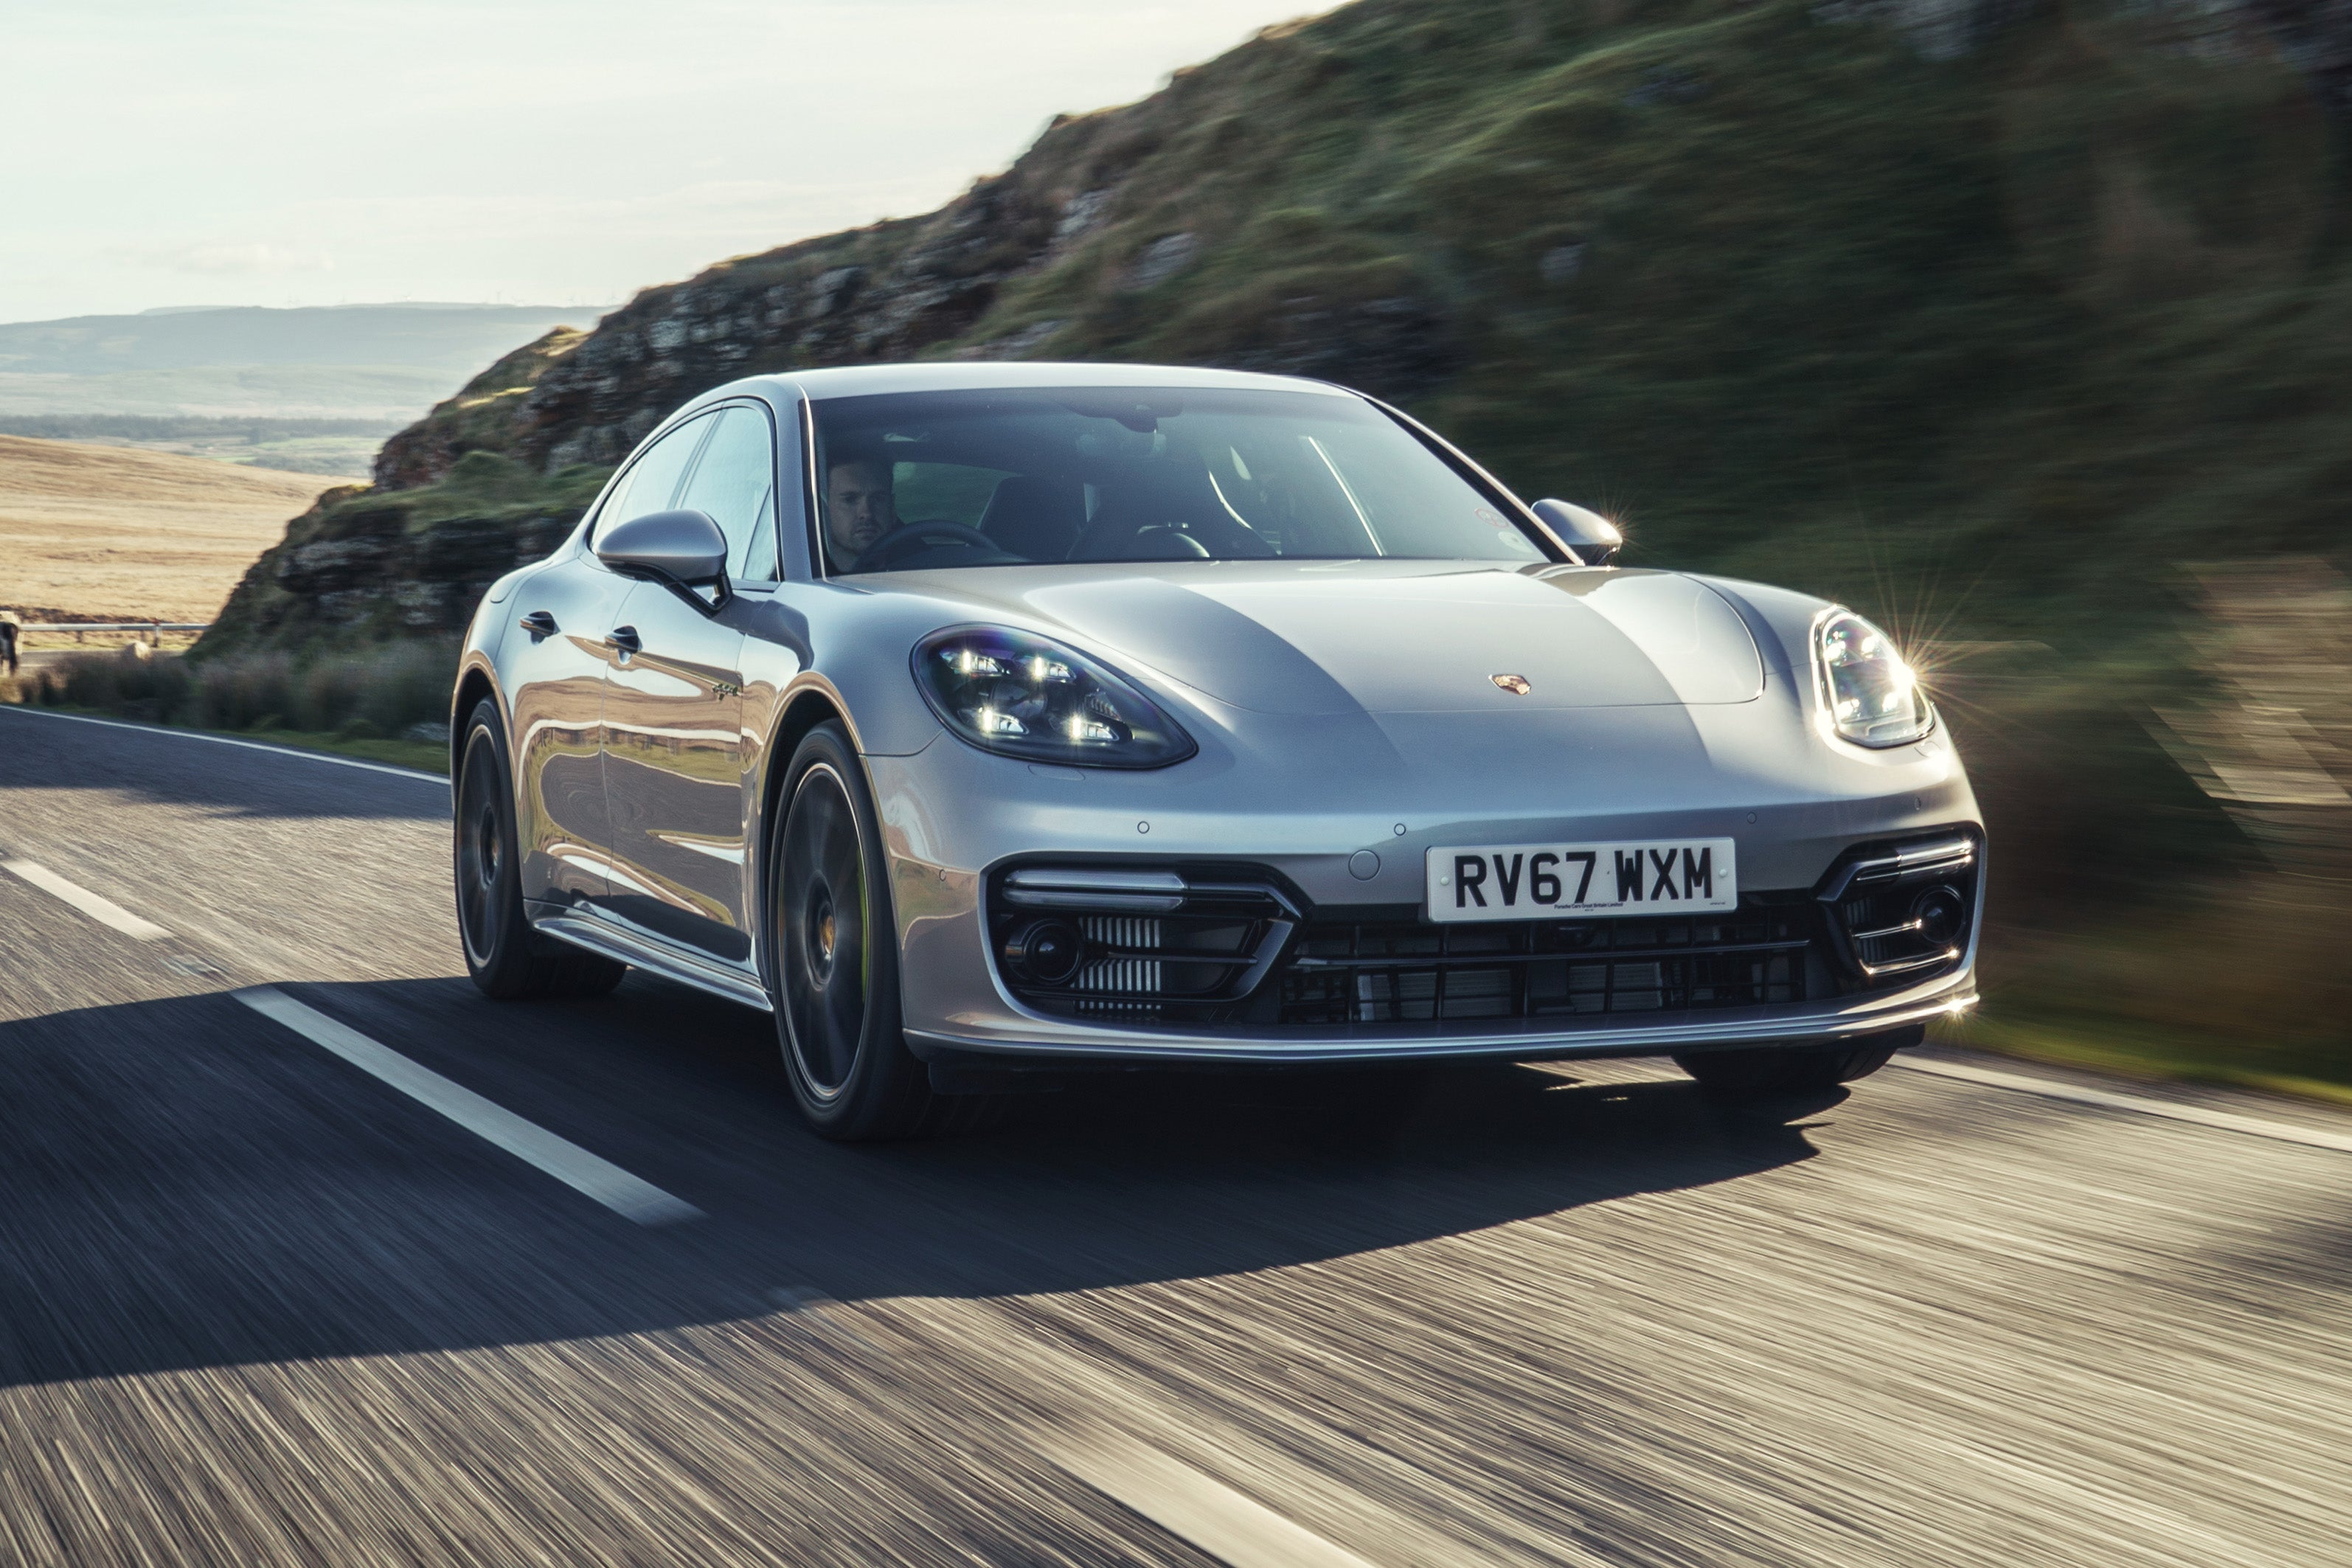 Porsche Panamera Front View